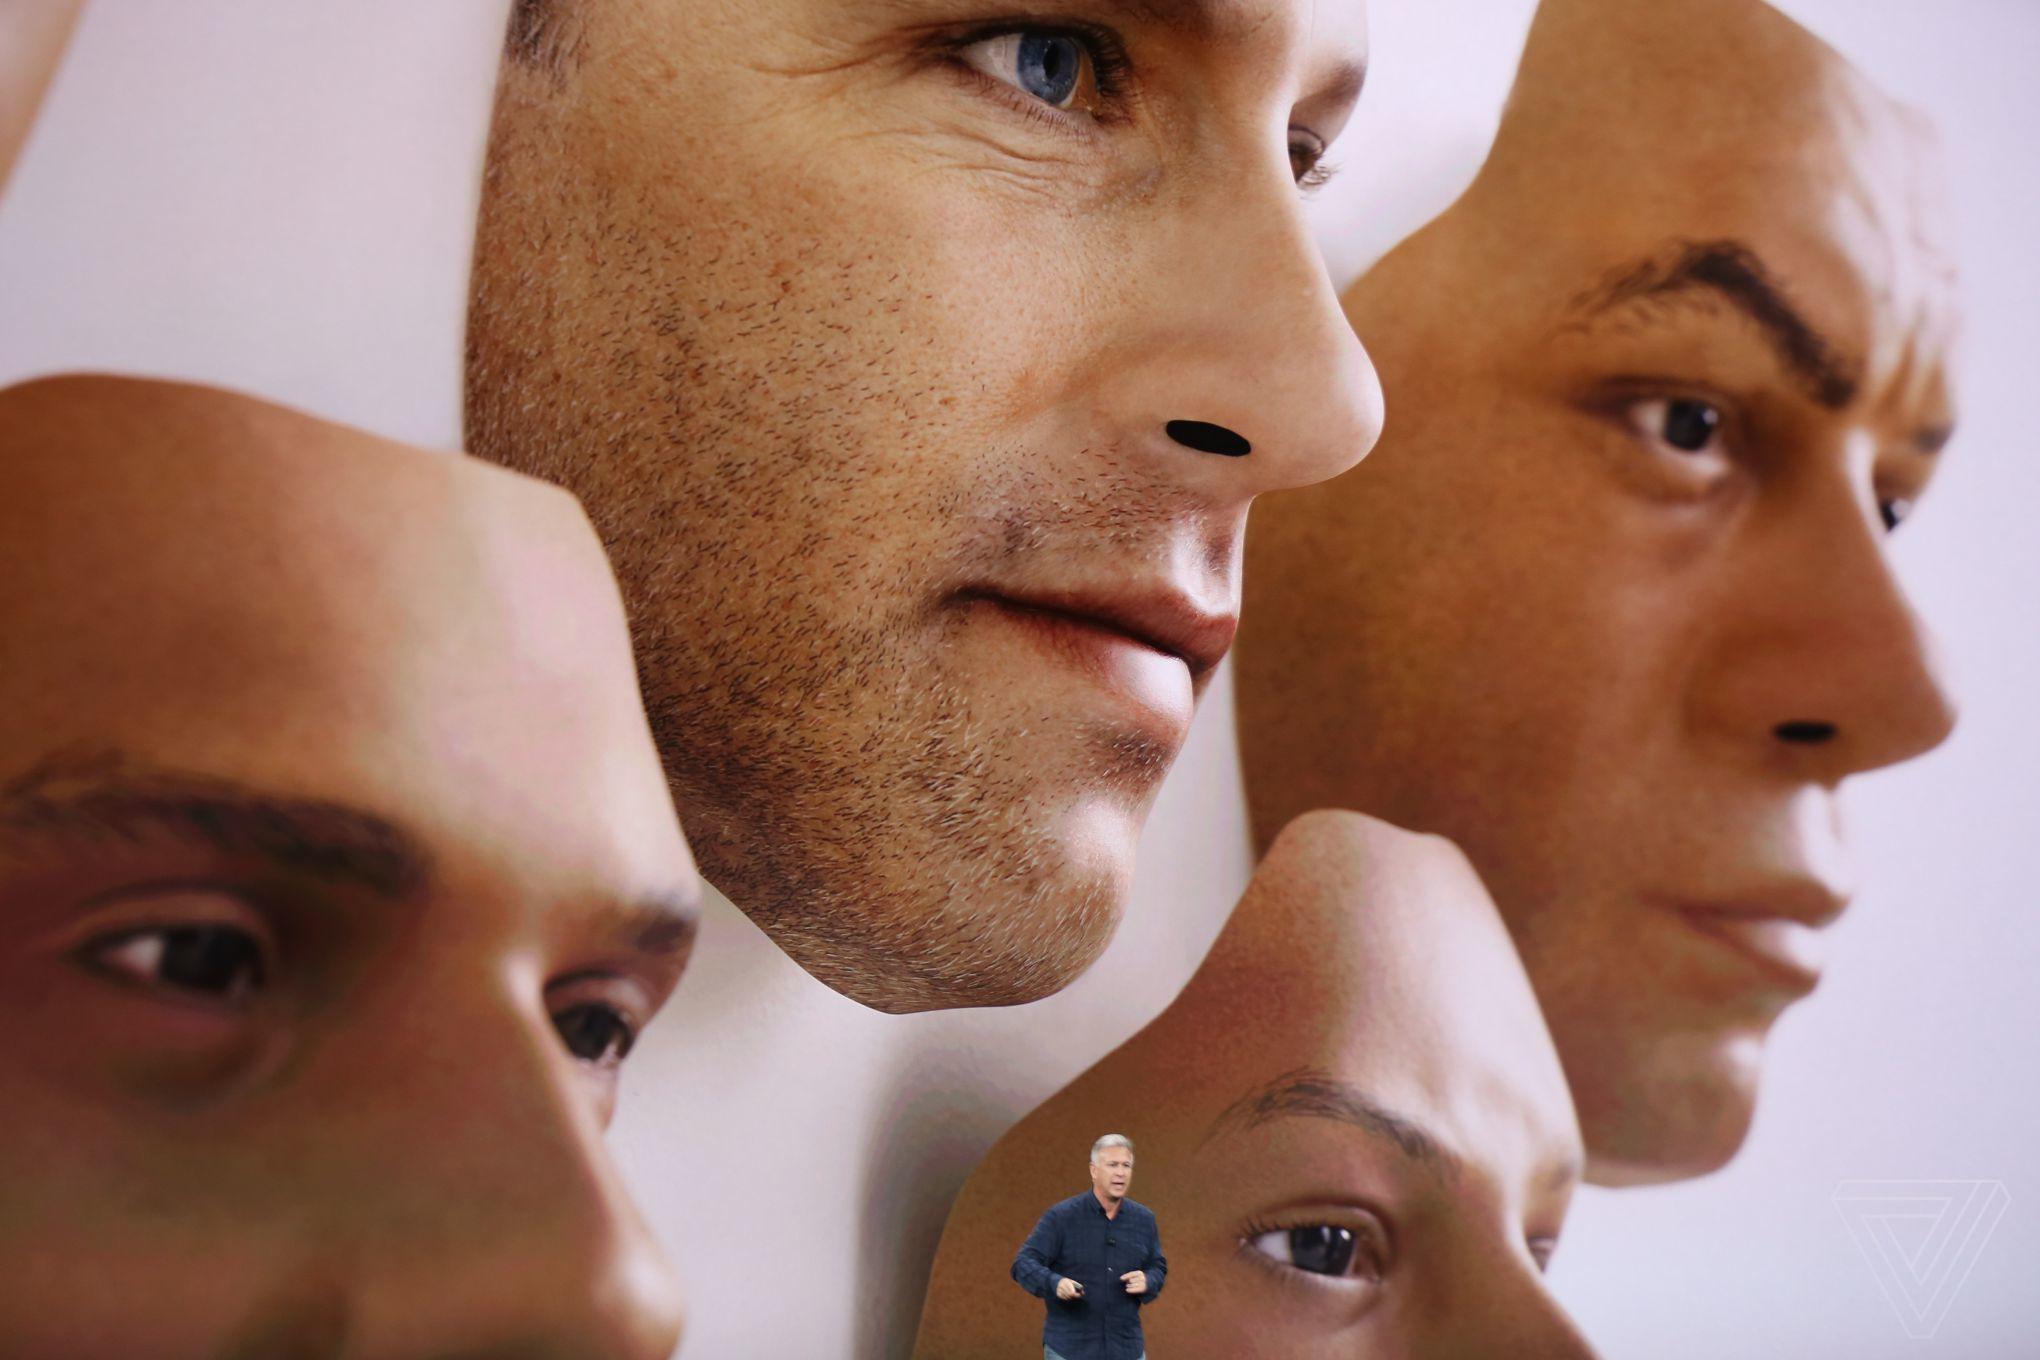 iPhone X camera 3D Face ID